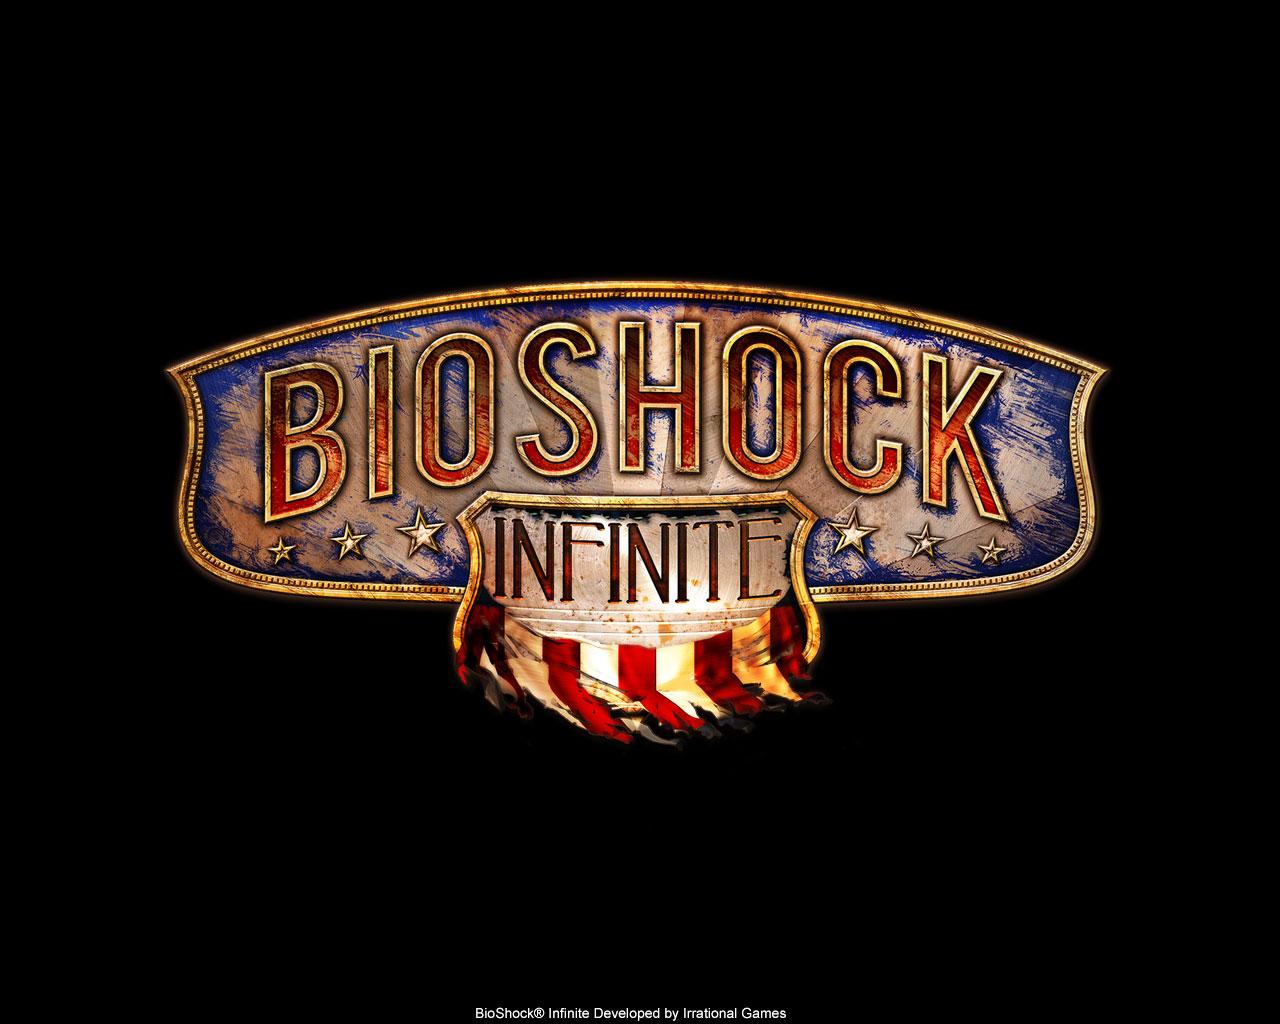 Bioshock infinte naked mod video nude comic